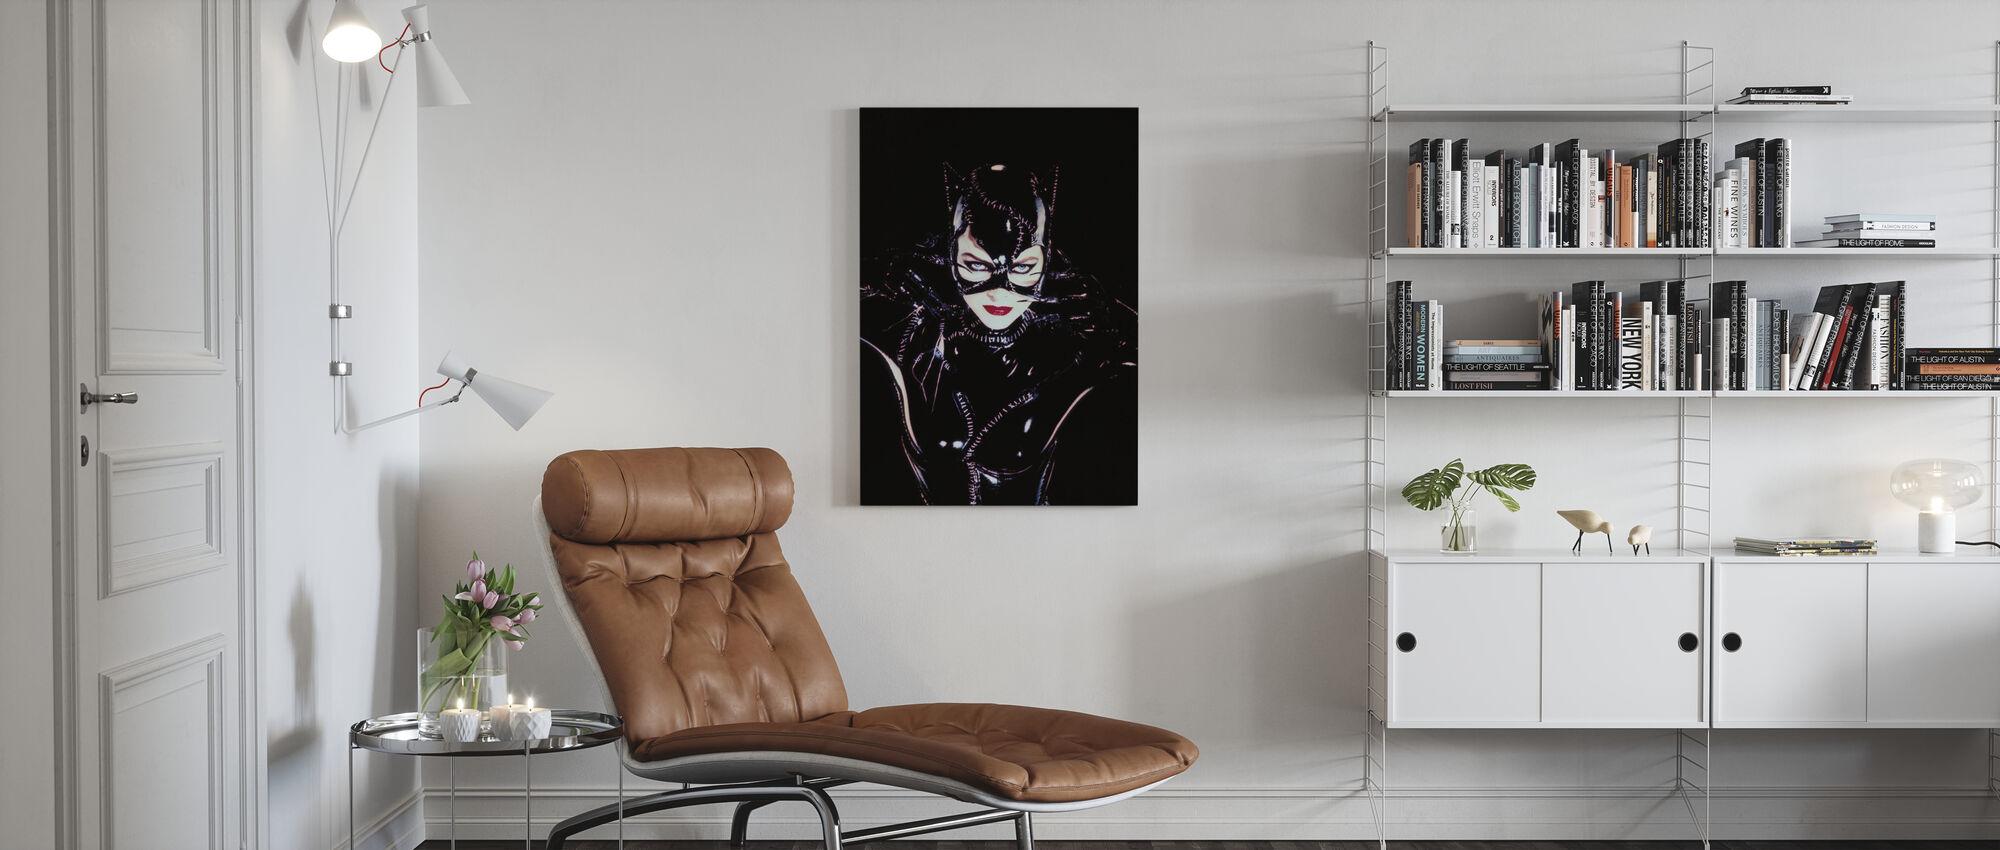 Michelle Pfeiffer in Batman Returns - Canvas print - Living Room